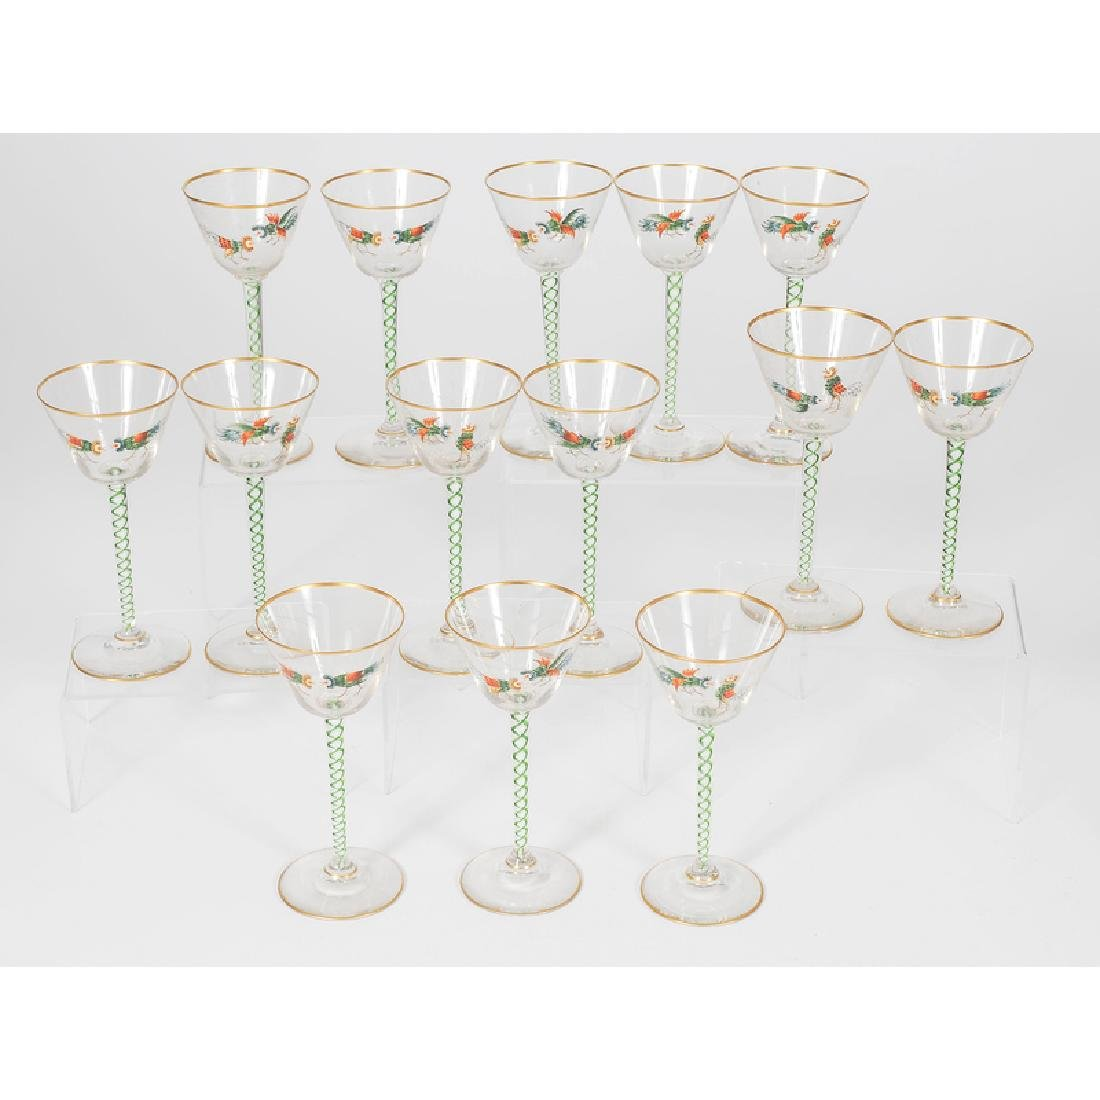 Threaded Glass Wine Glasses - 2